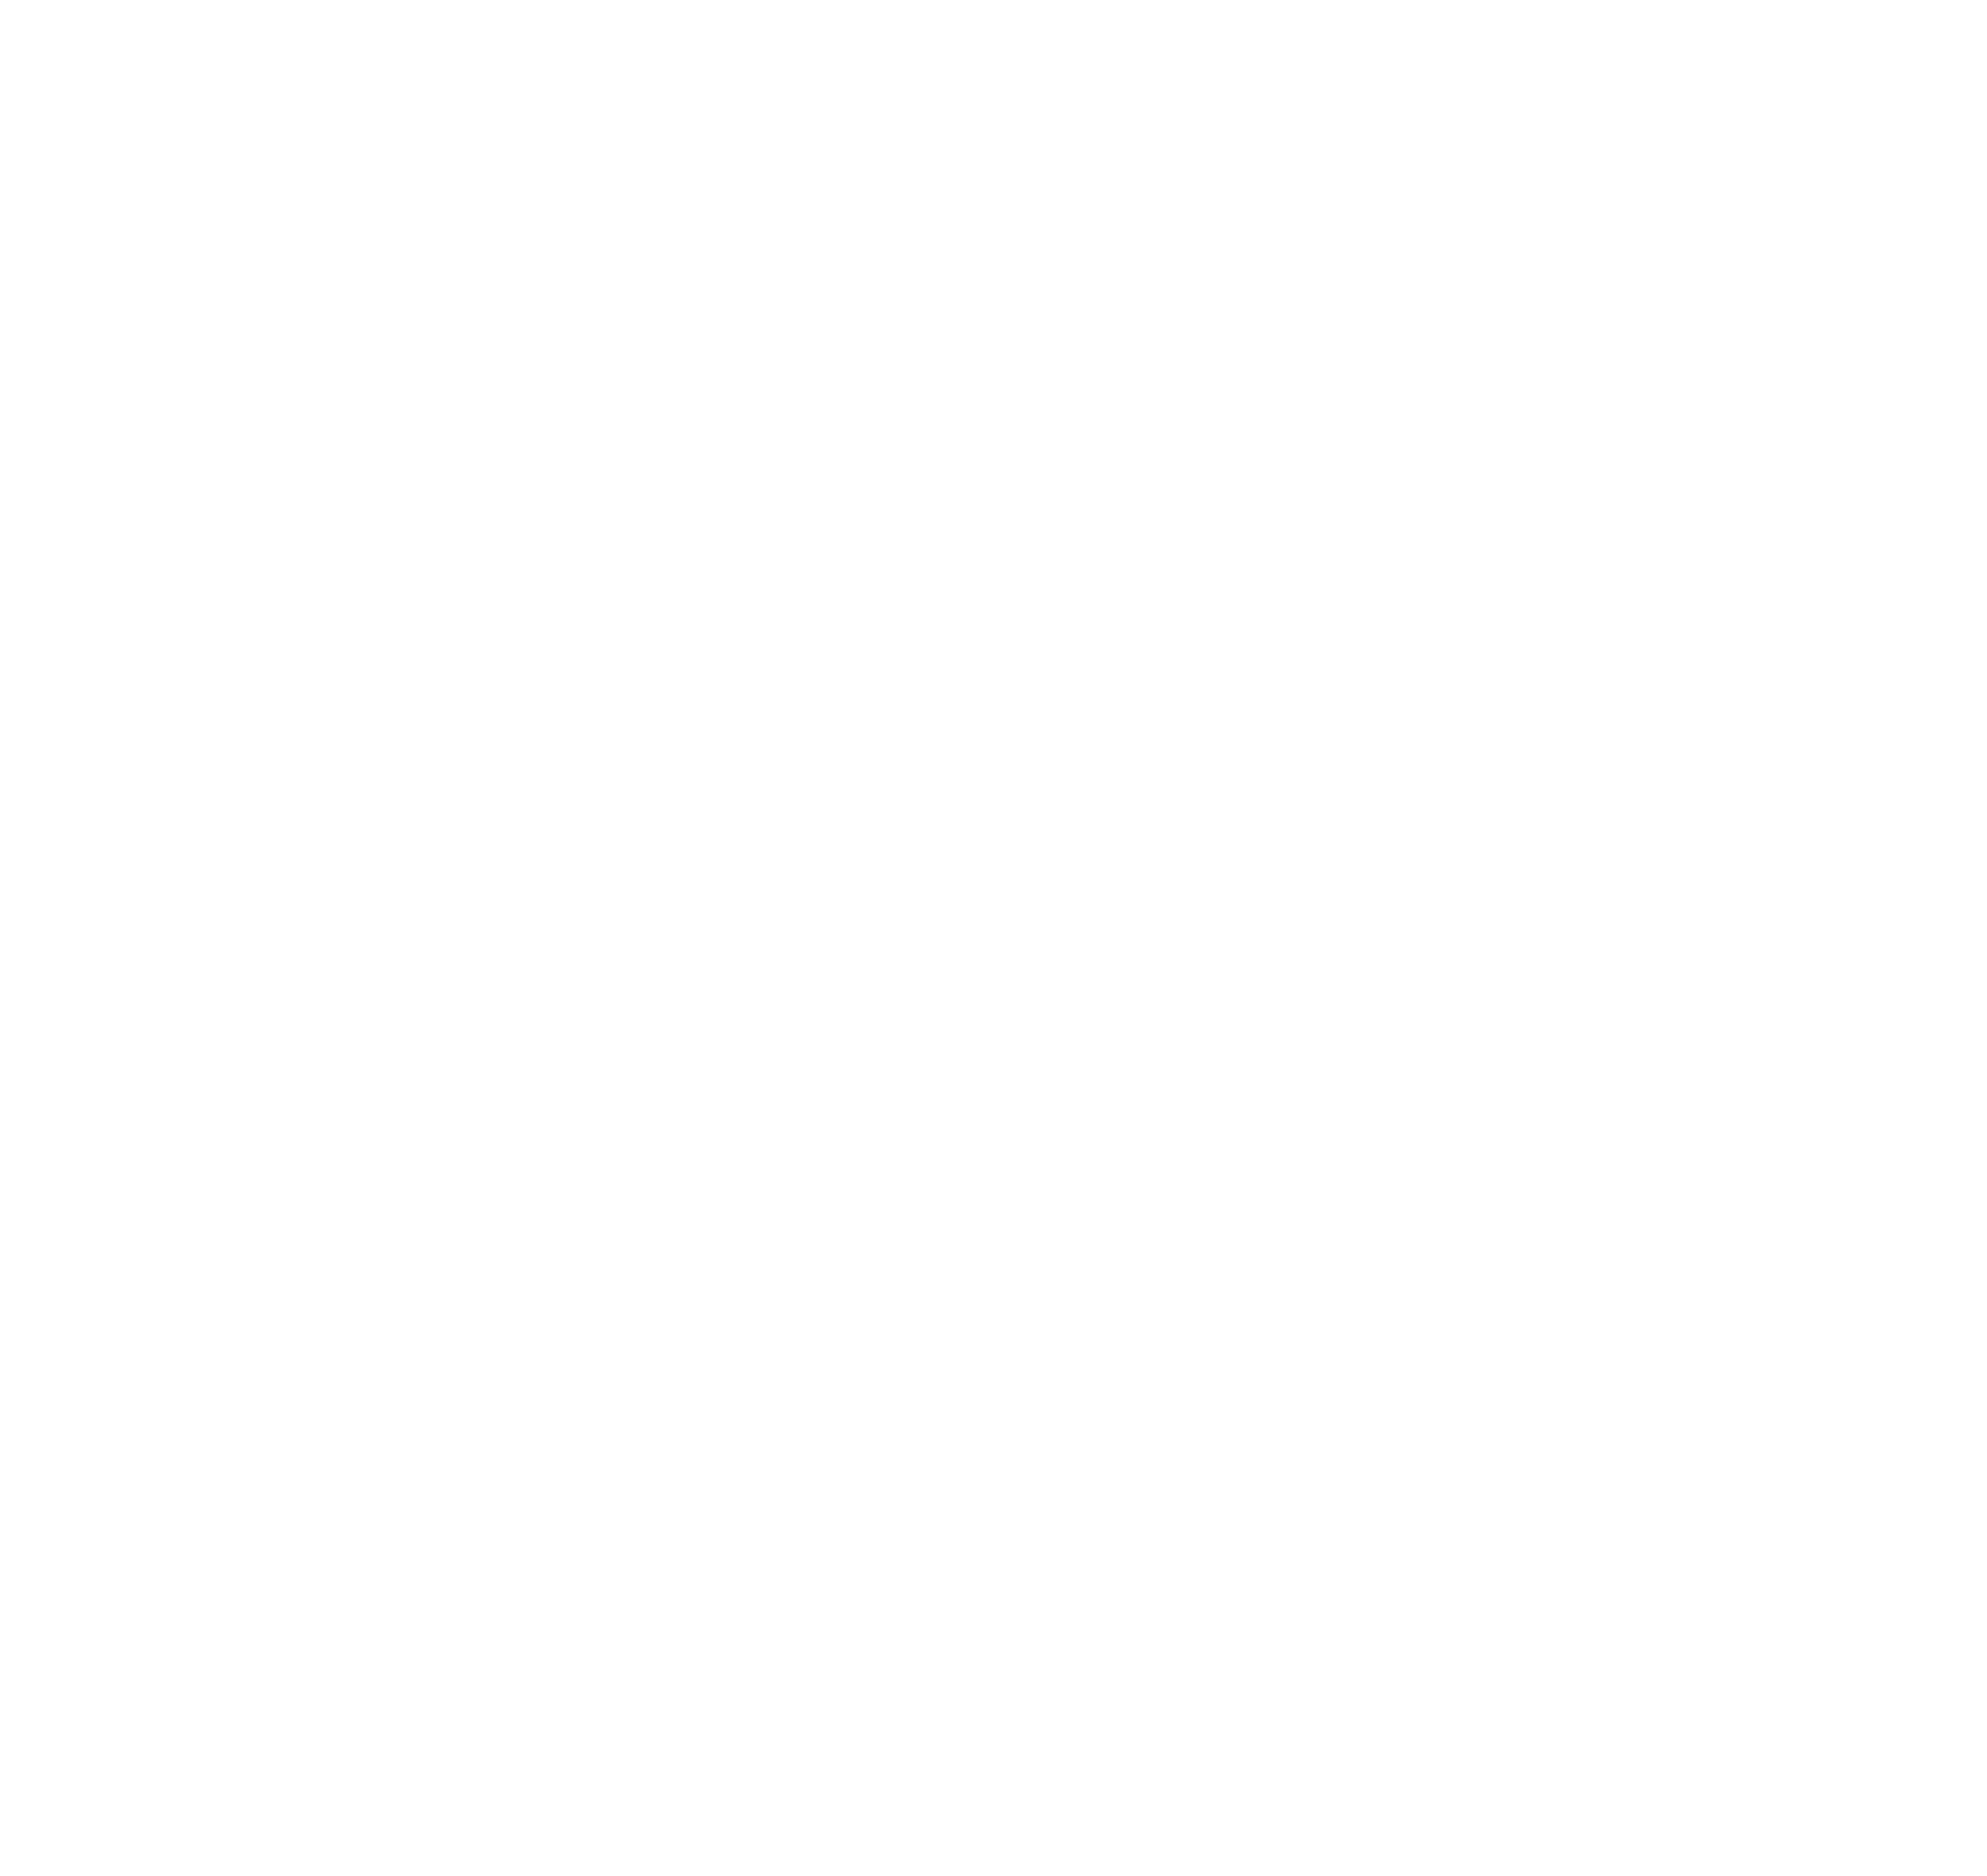 Keller Williams Greater Baton Rouge logo